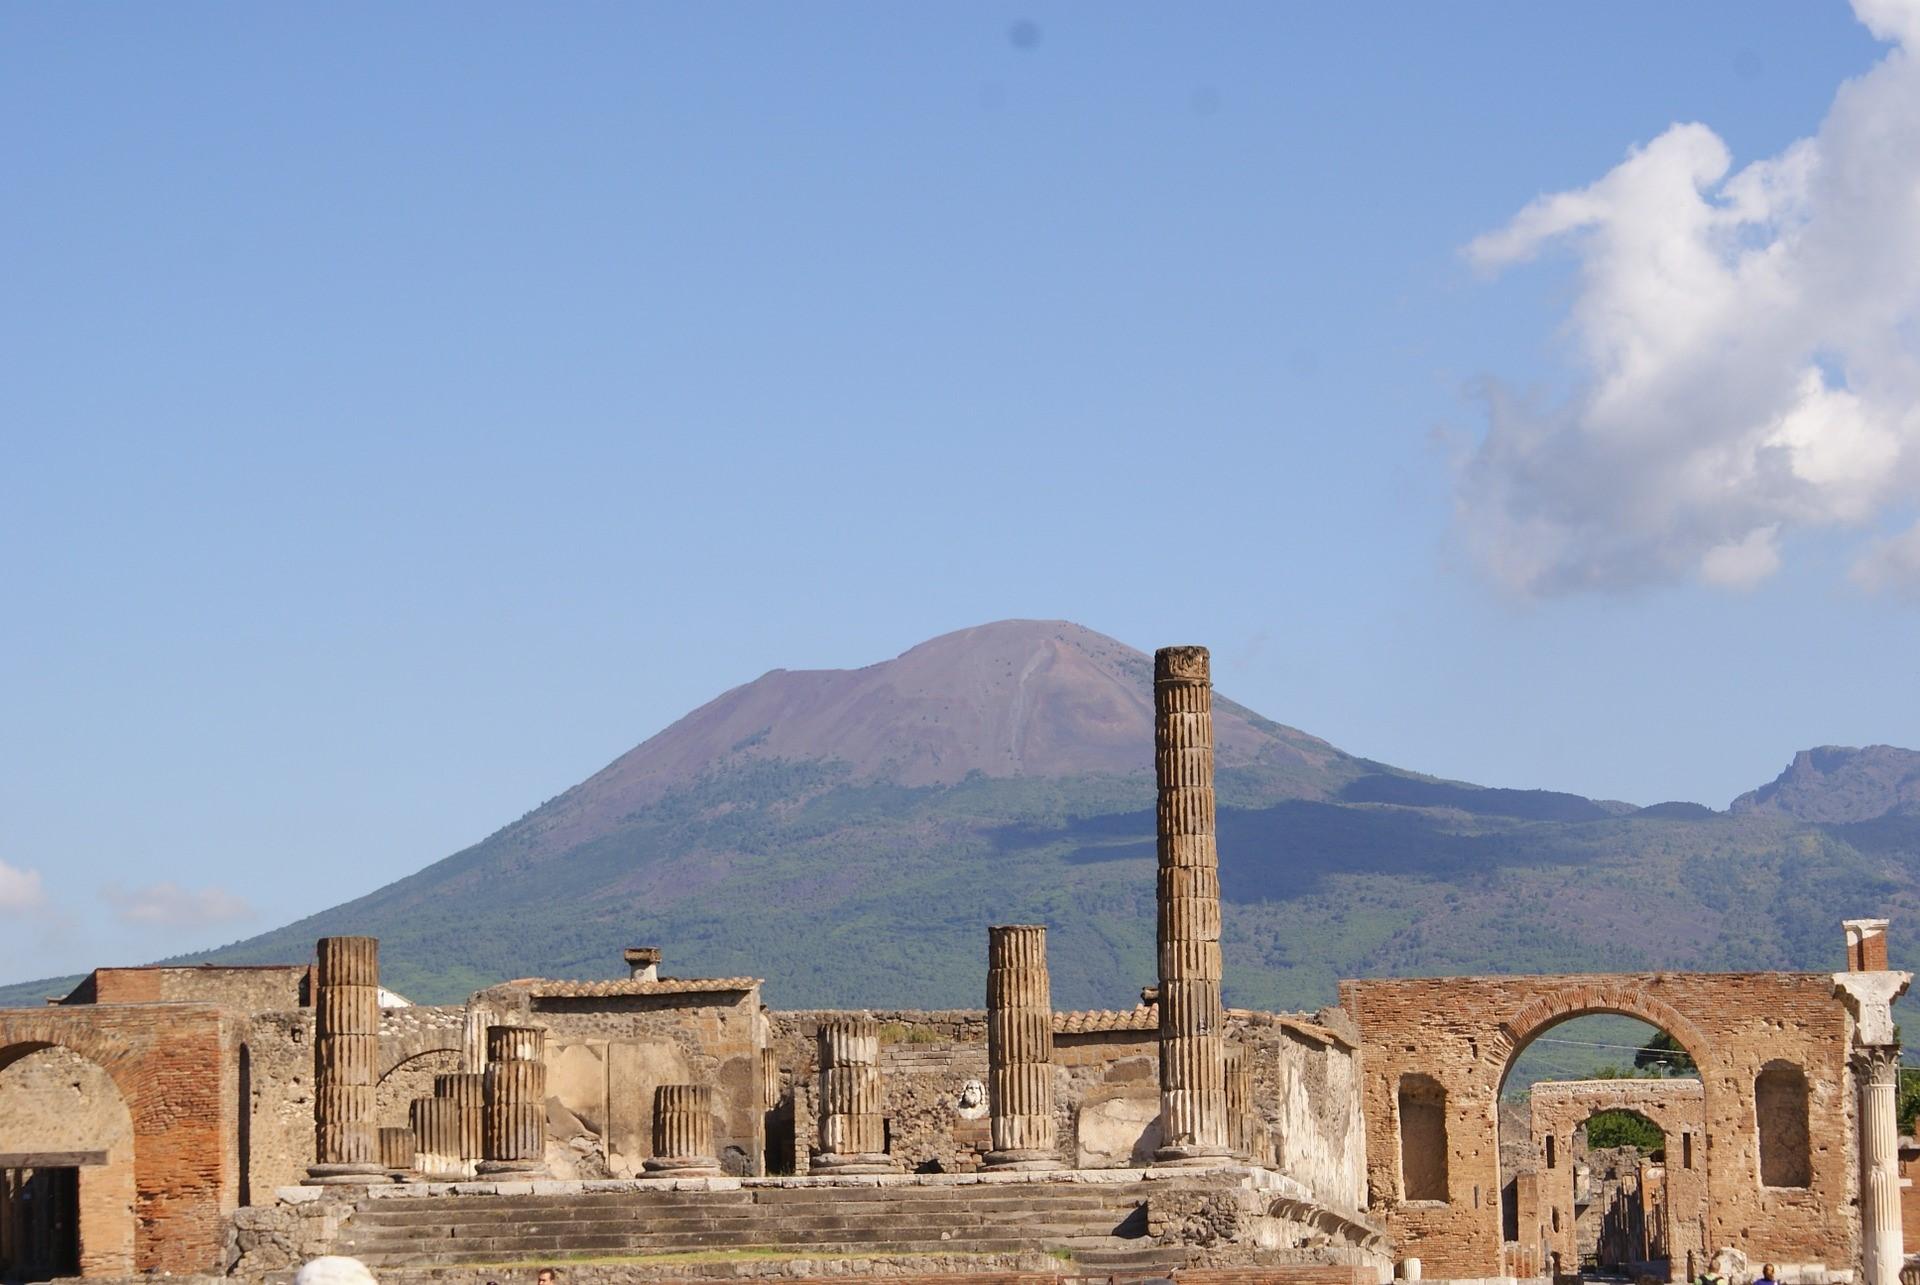 Храм Юпитера в Помпеях на фоне Везувия